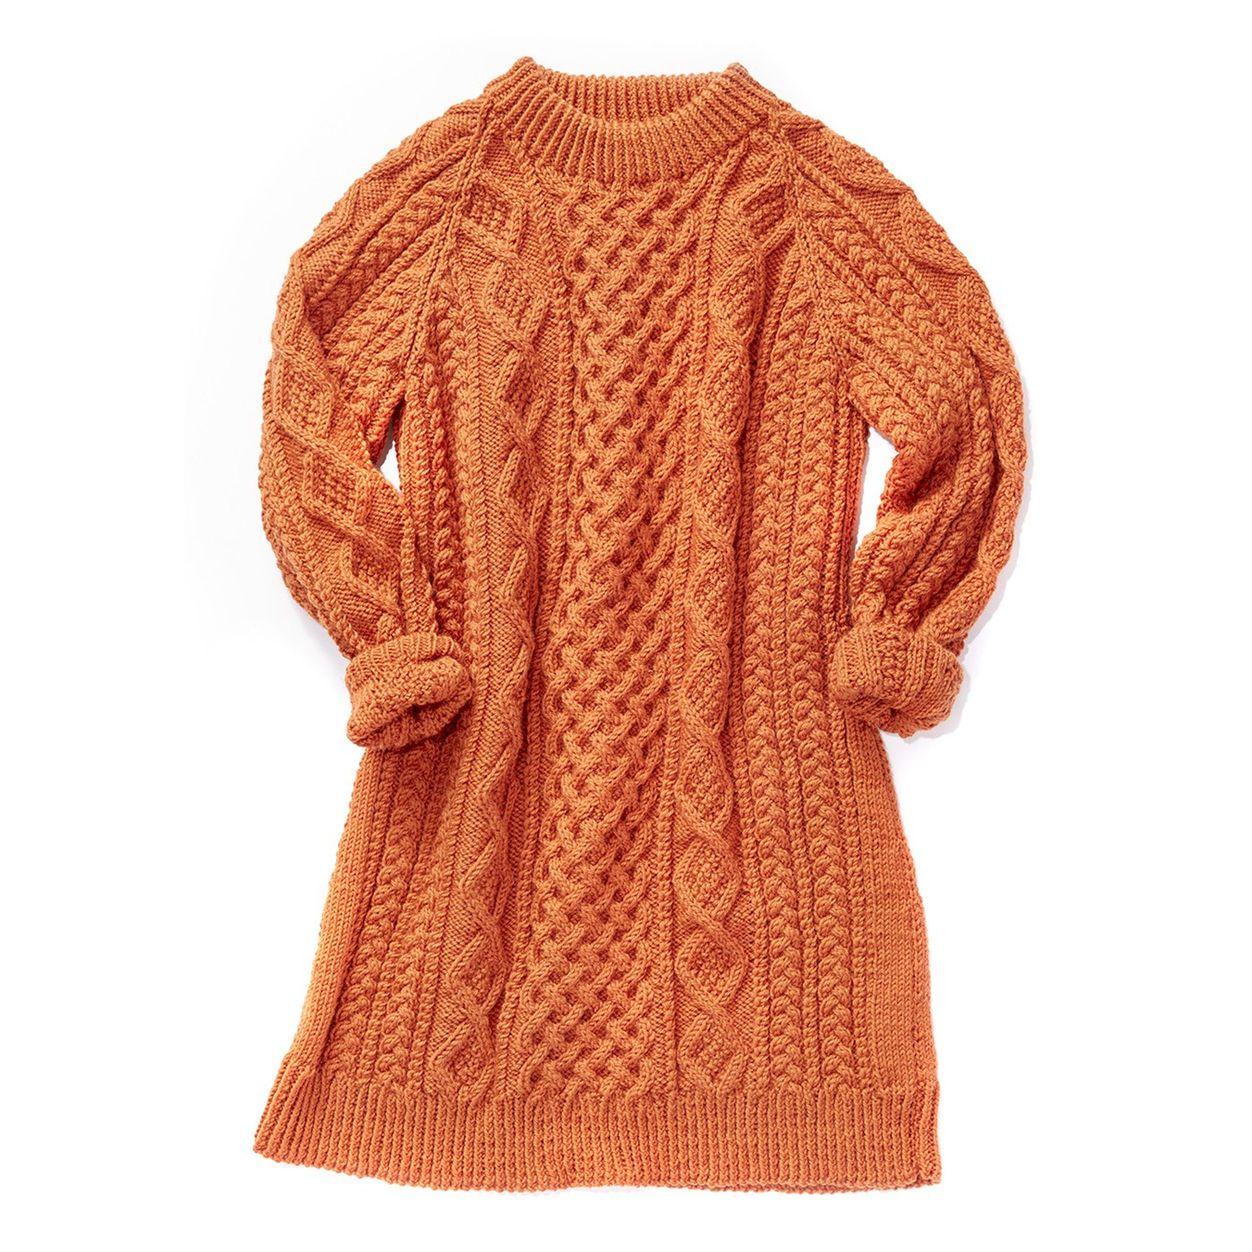 Patons Honeycomb Aran Dress 2xl 3xl Knitting Patterns